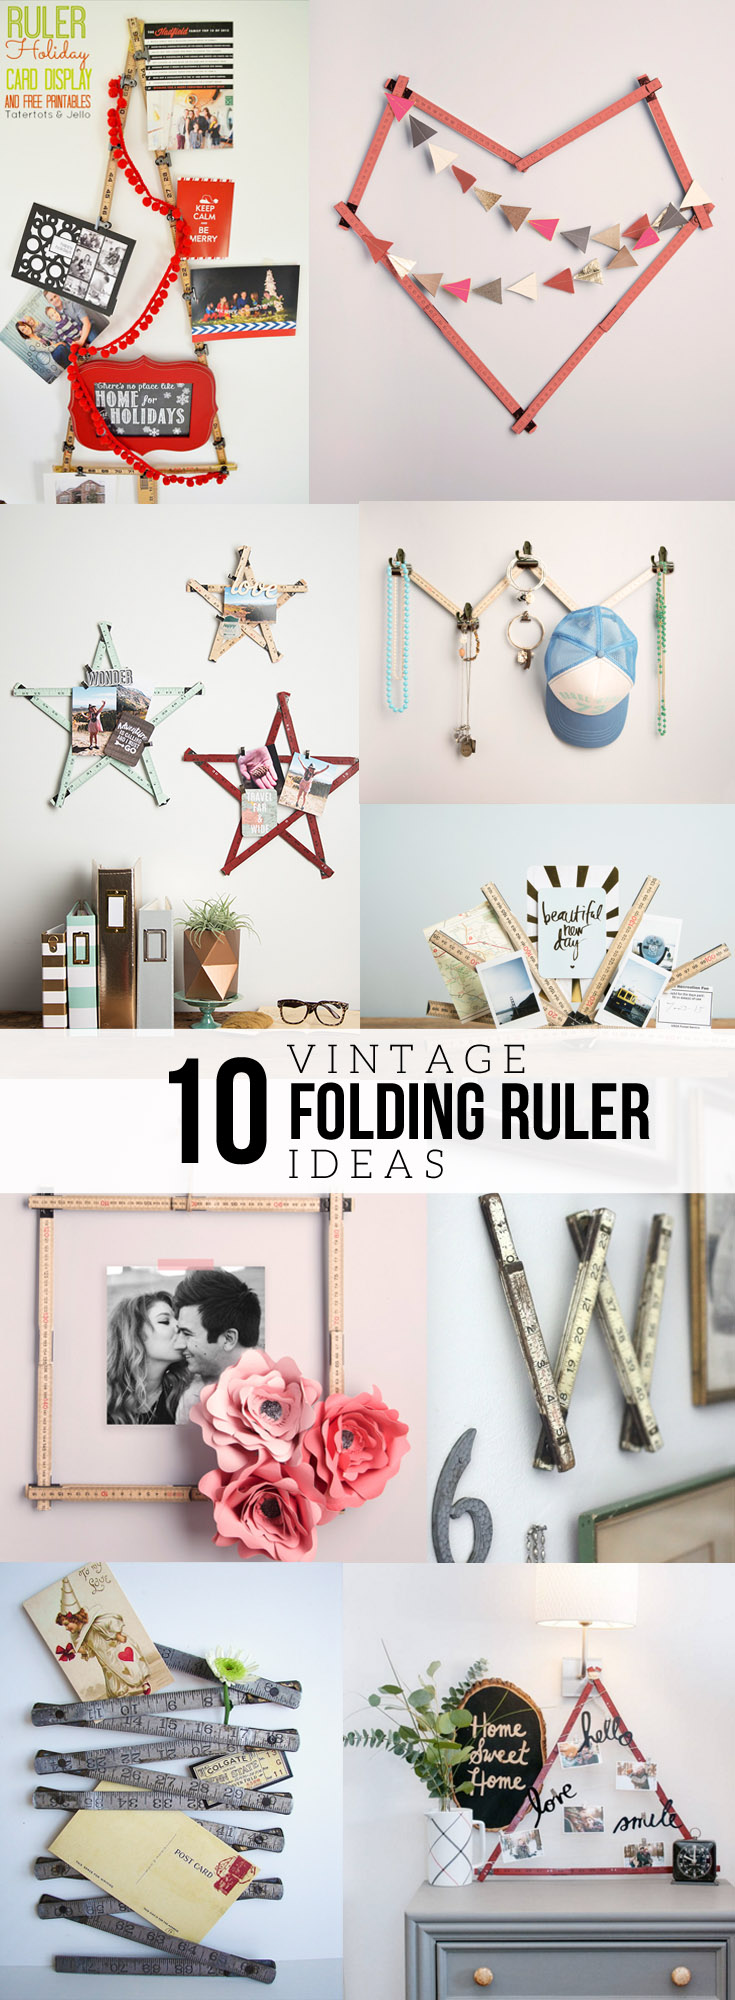 10 Vintage Folding Ruler Ideas, DIY Photo Display Idea using a Vintage Folding Ruler, Instagram Photo Display, by @CraftivityD